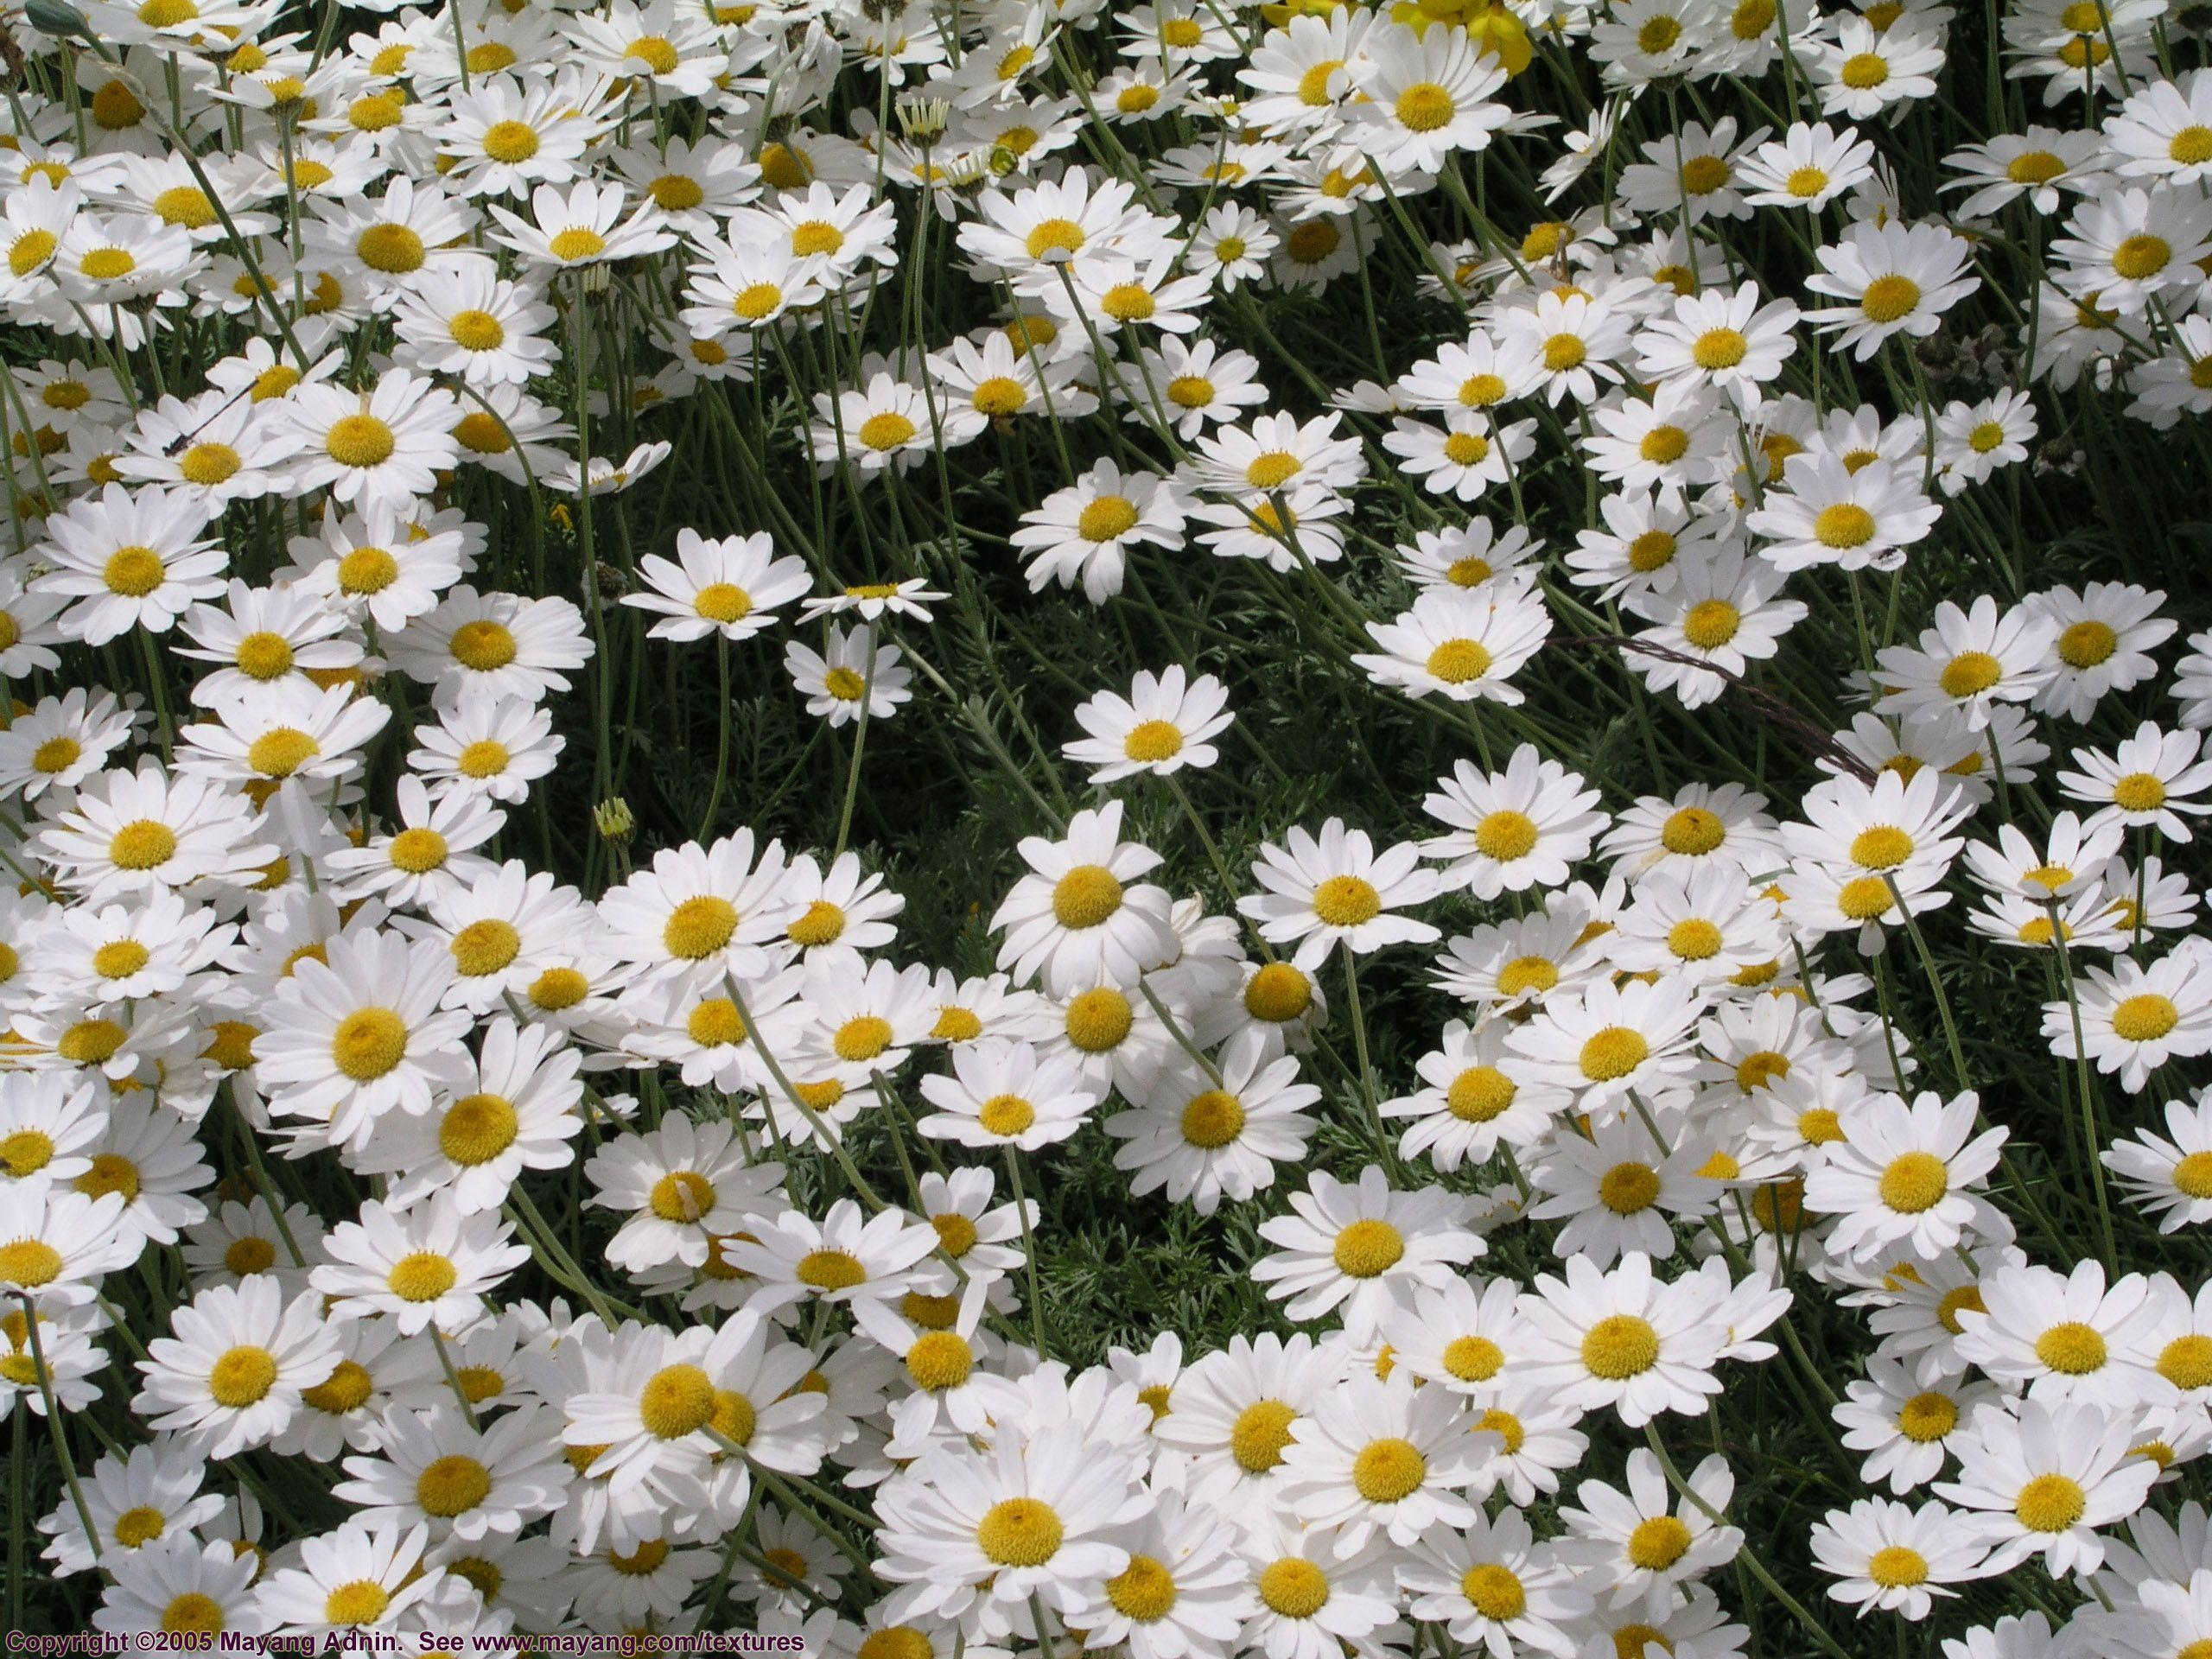 Tiny Daisy Like Flowers Google Search Flowers Pinterest